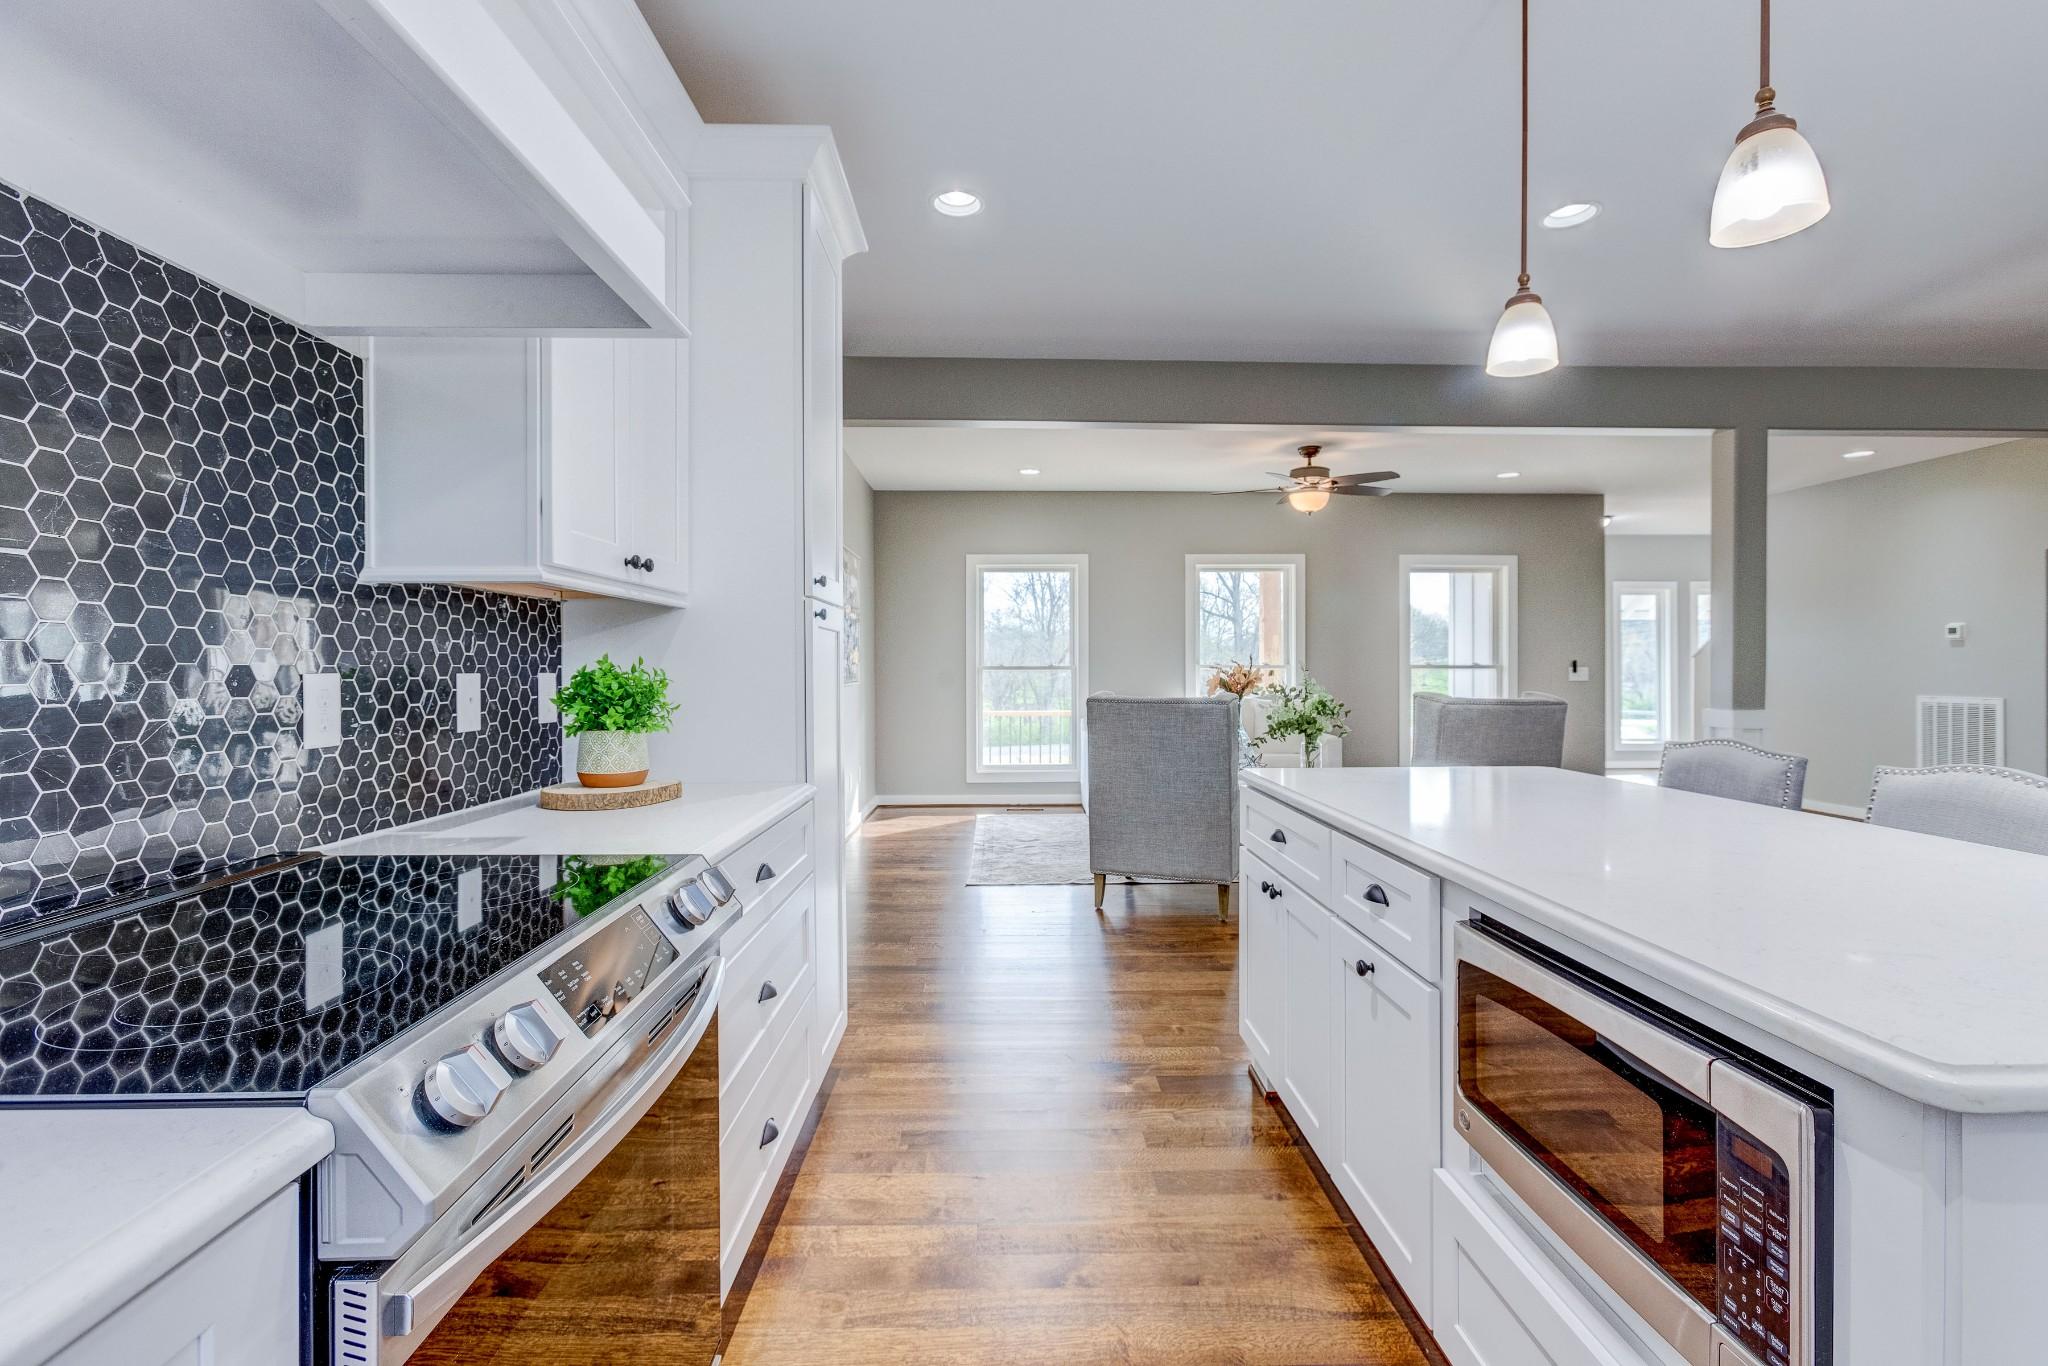 794 Brights Ln Property Photo - Gallatin, TN real estate listing